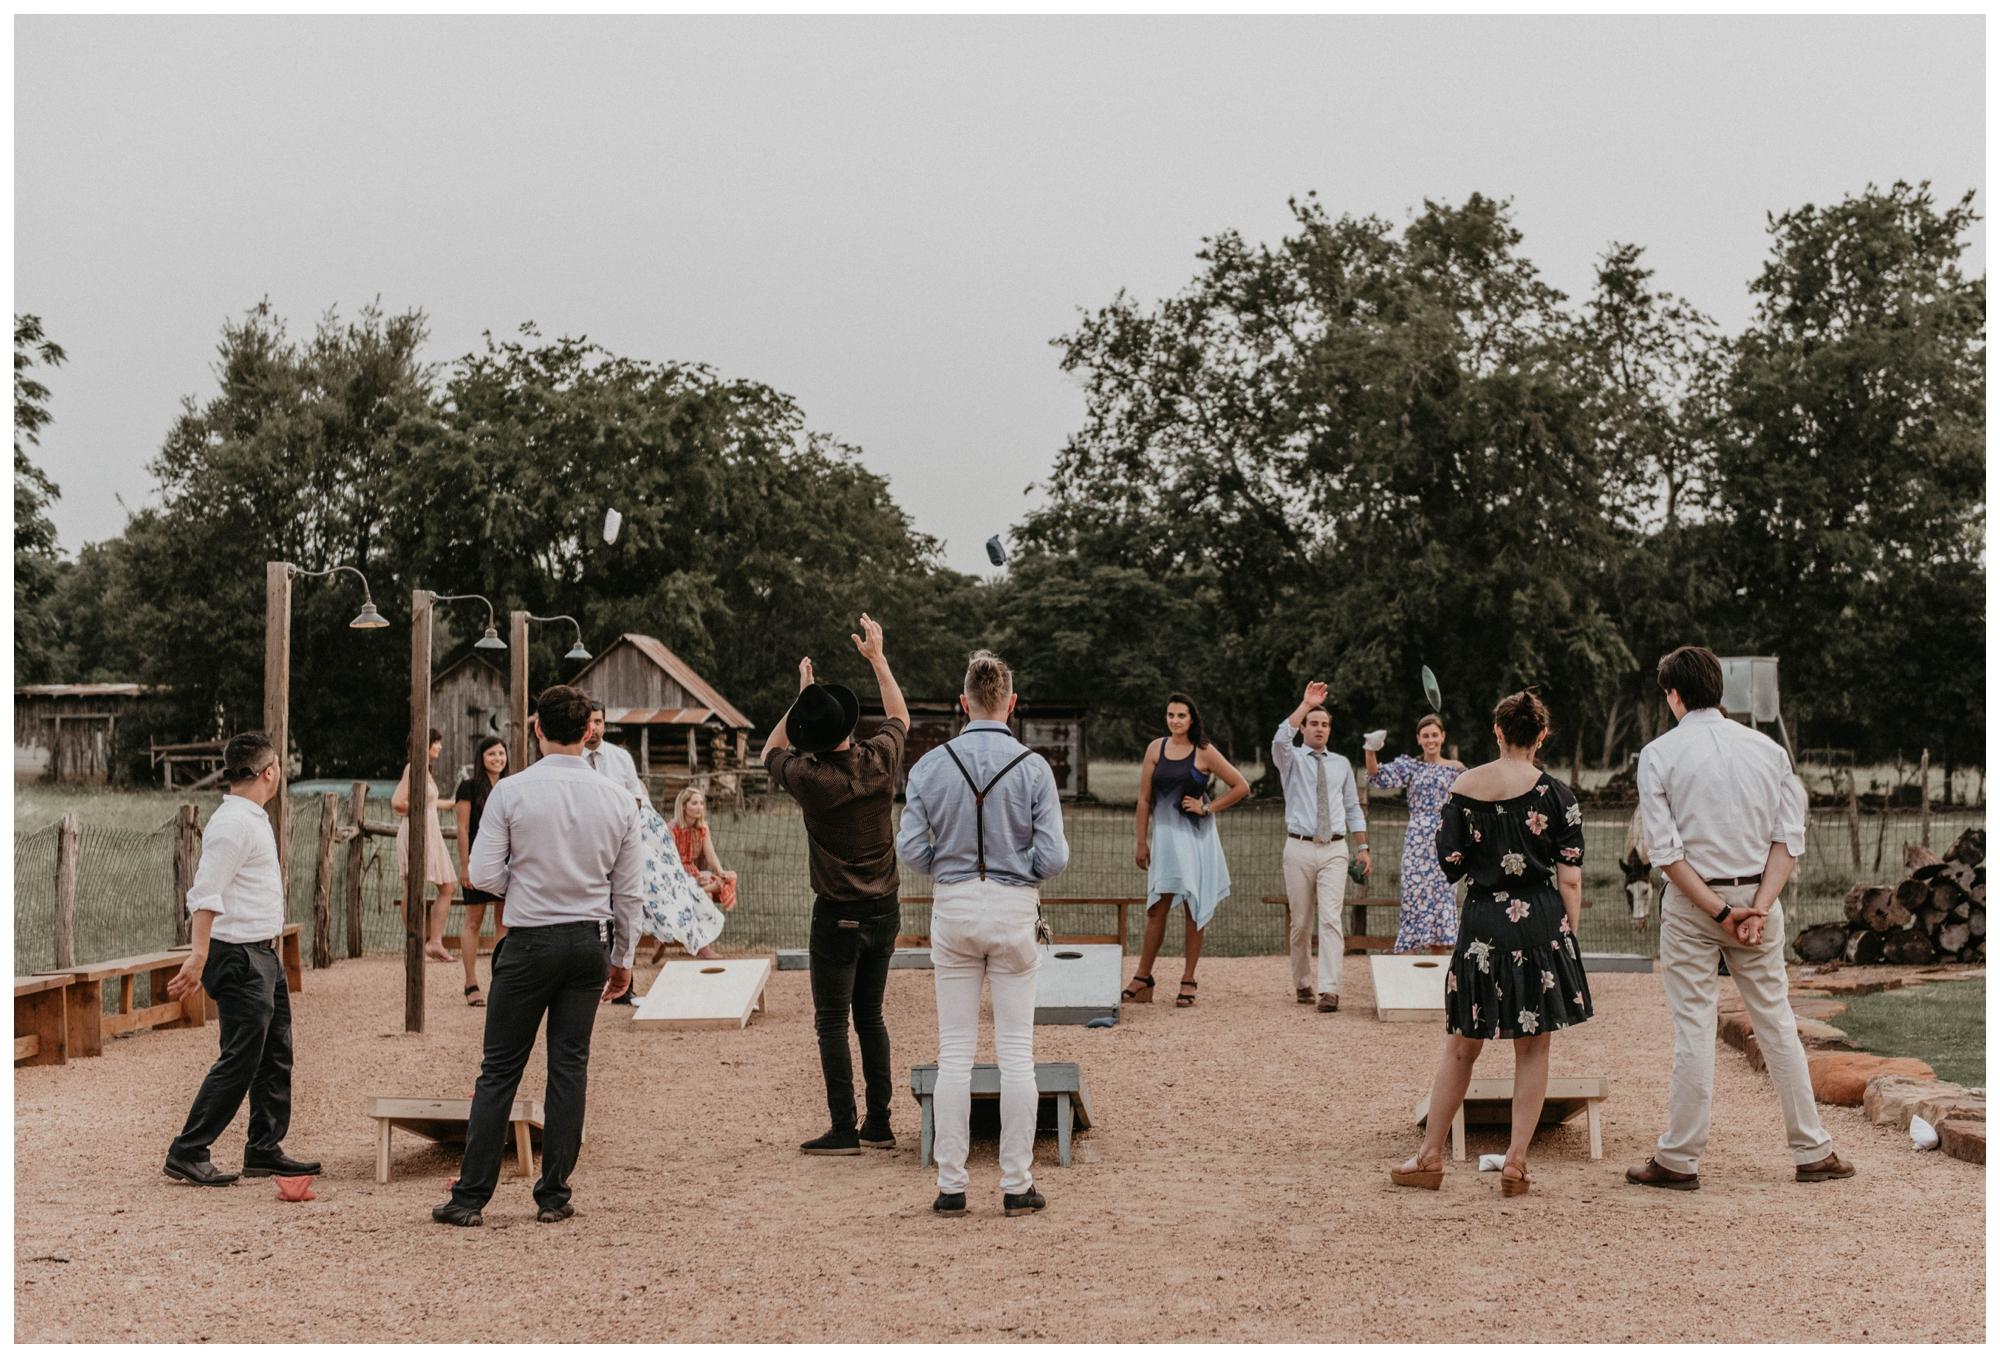 austin-texas-wedding-photography-1778-photographie_0139.jpg